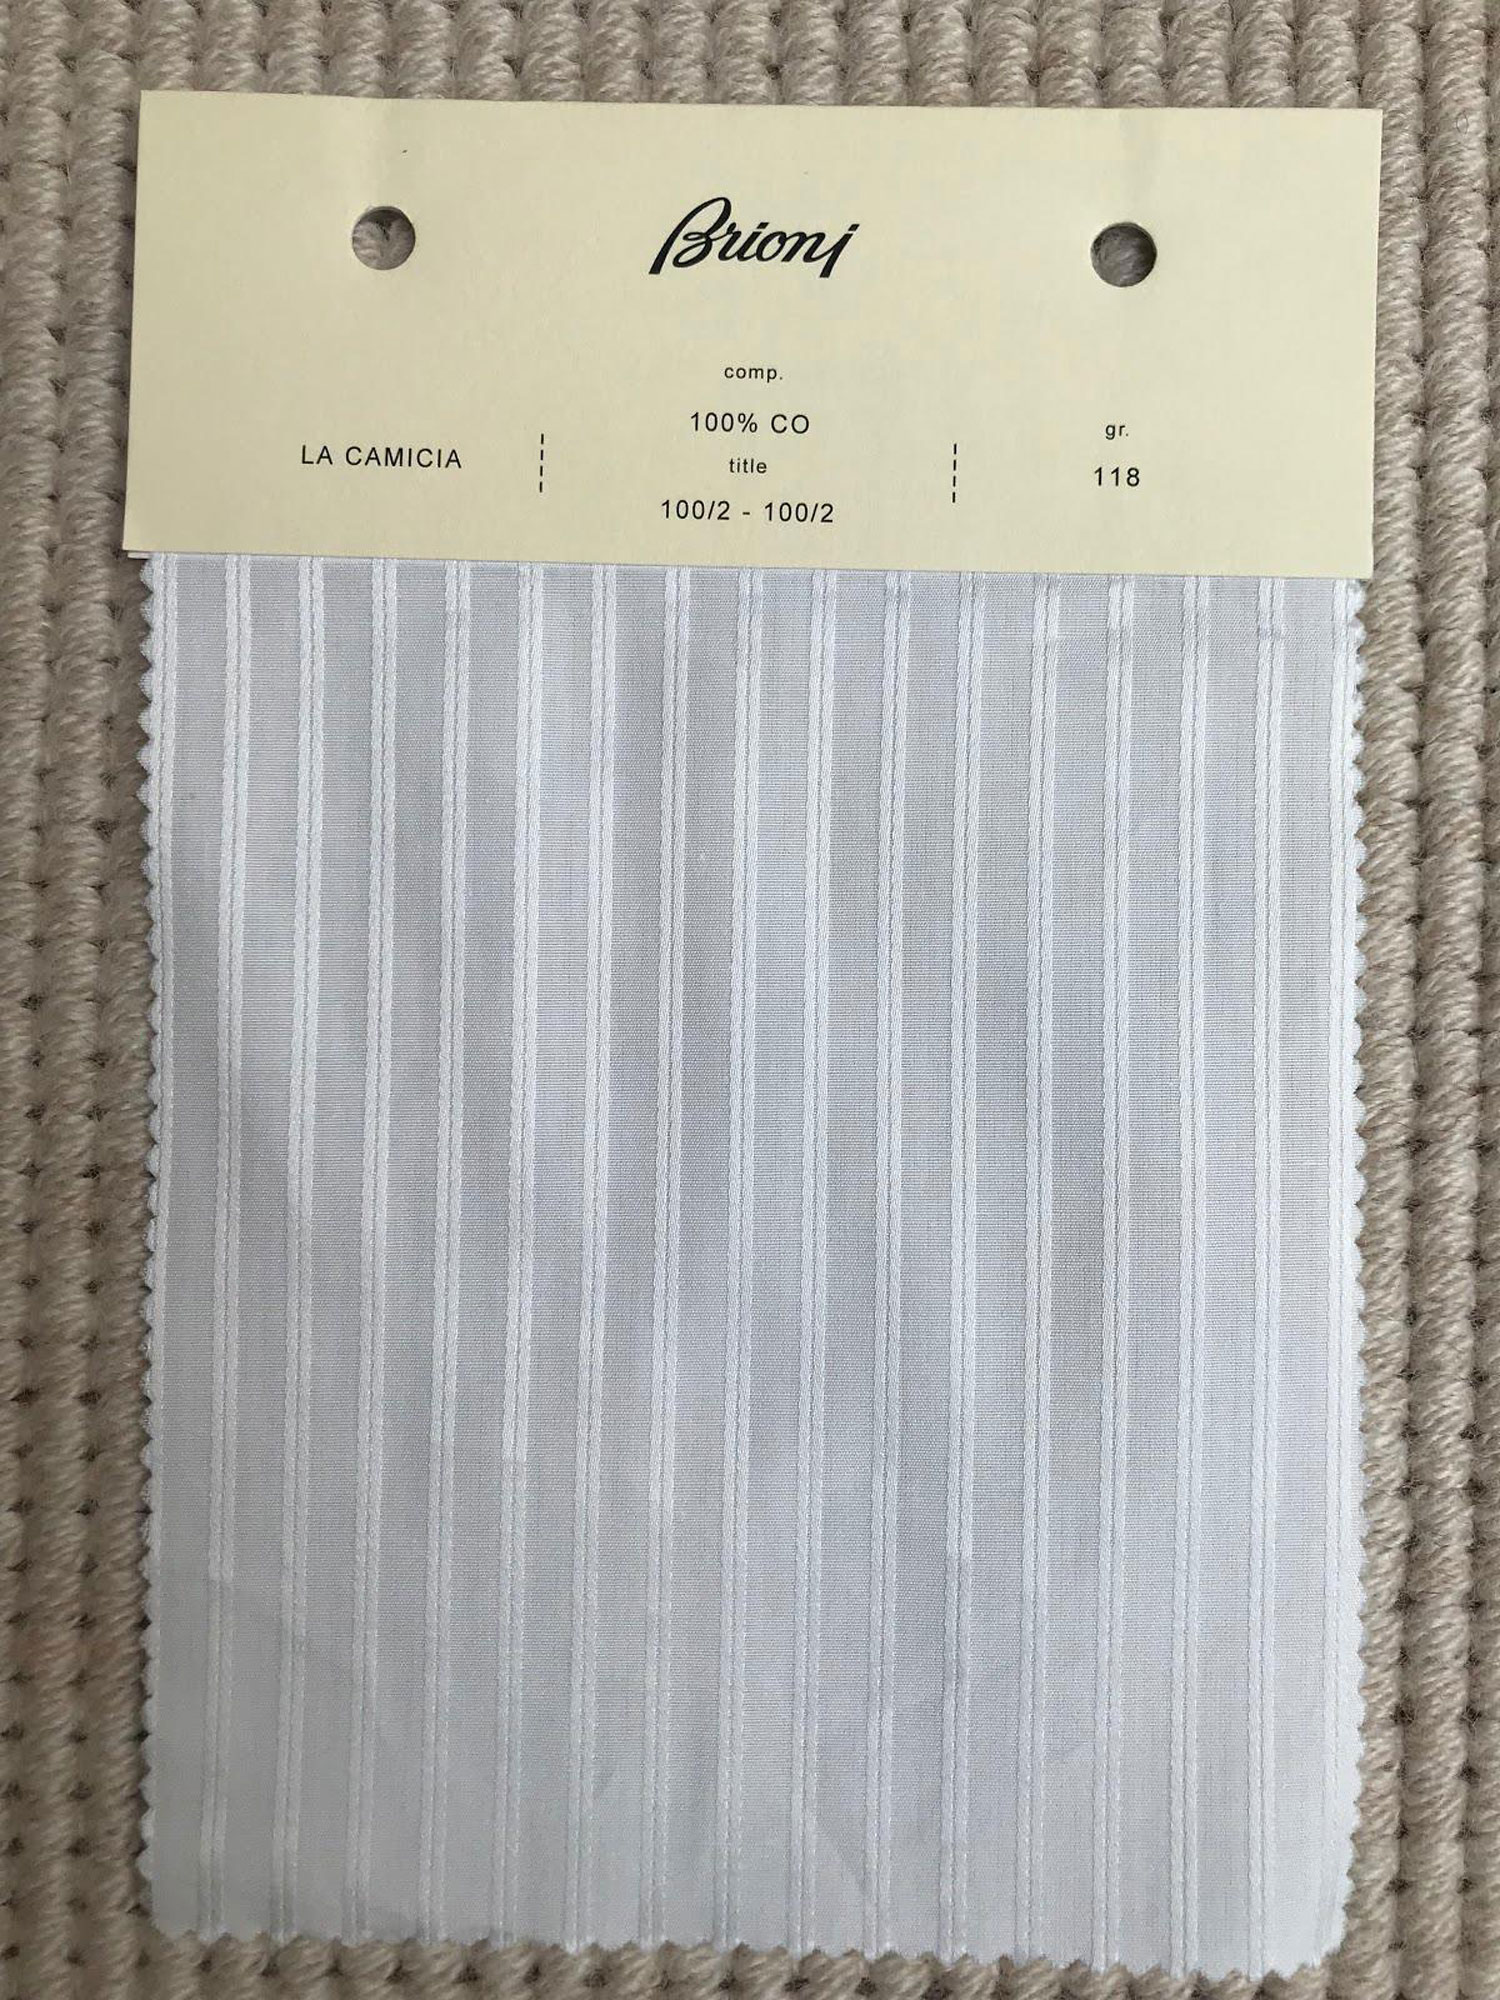 Brioni shirt fabric